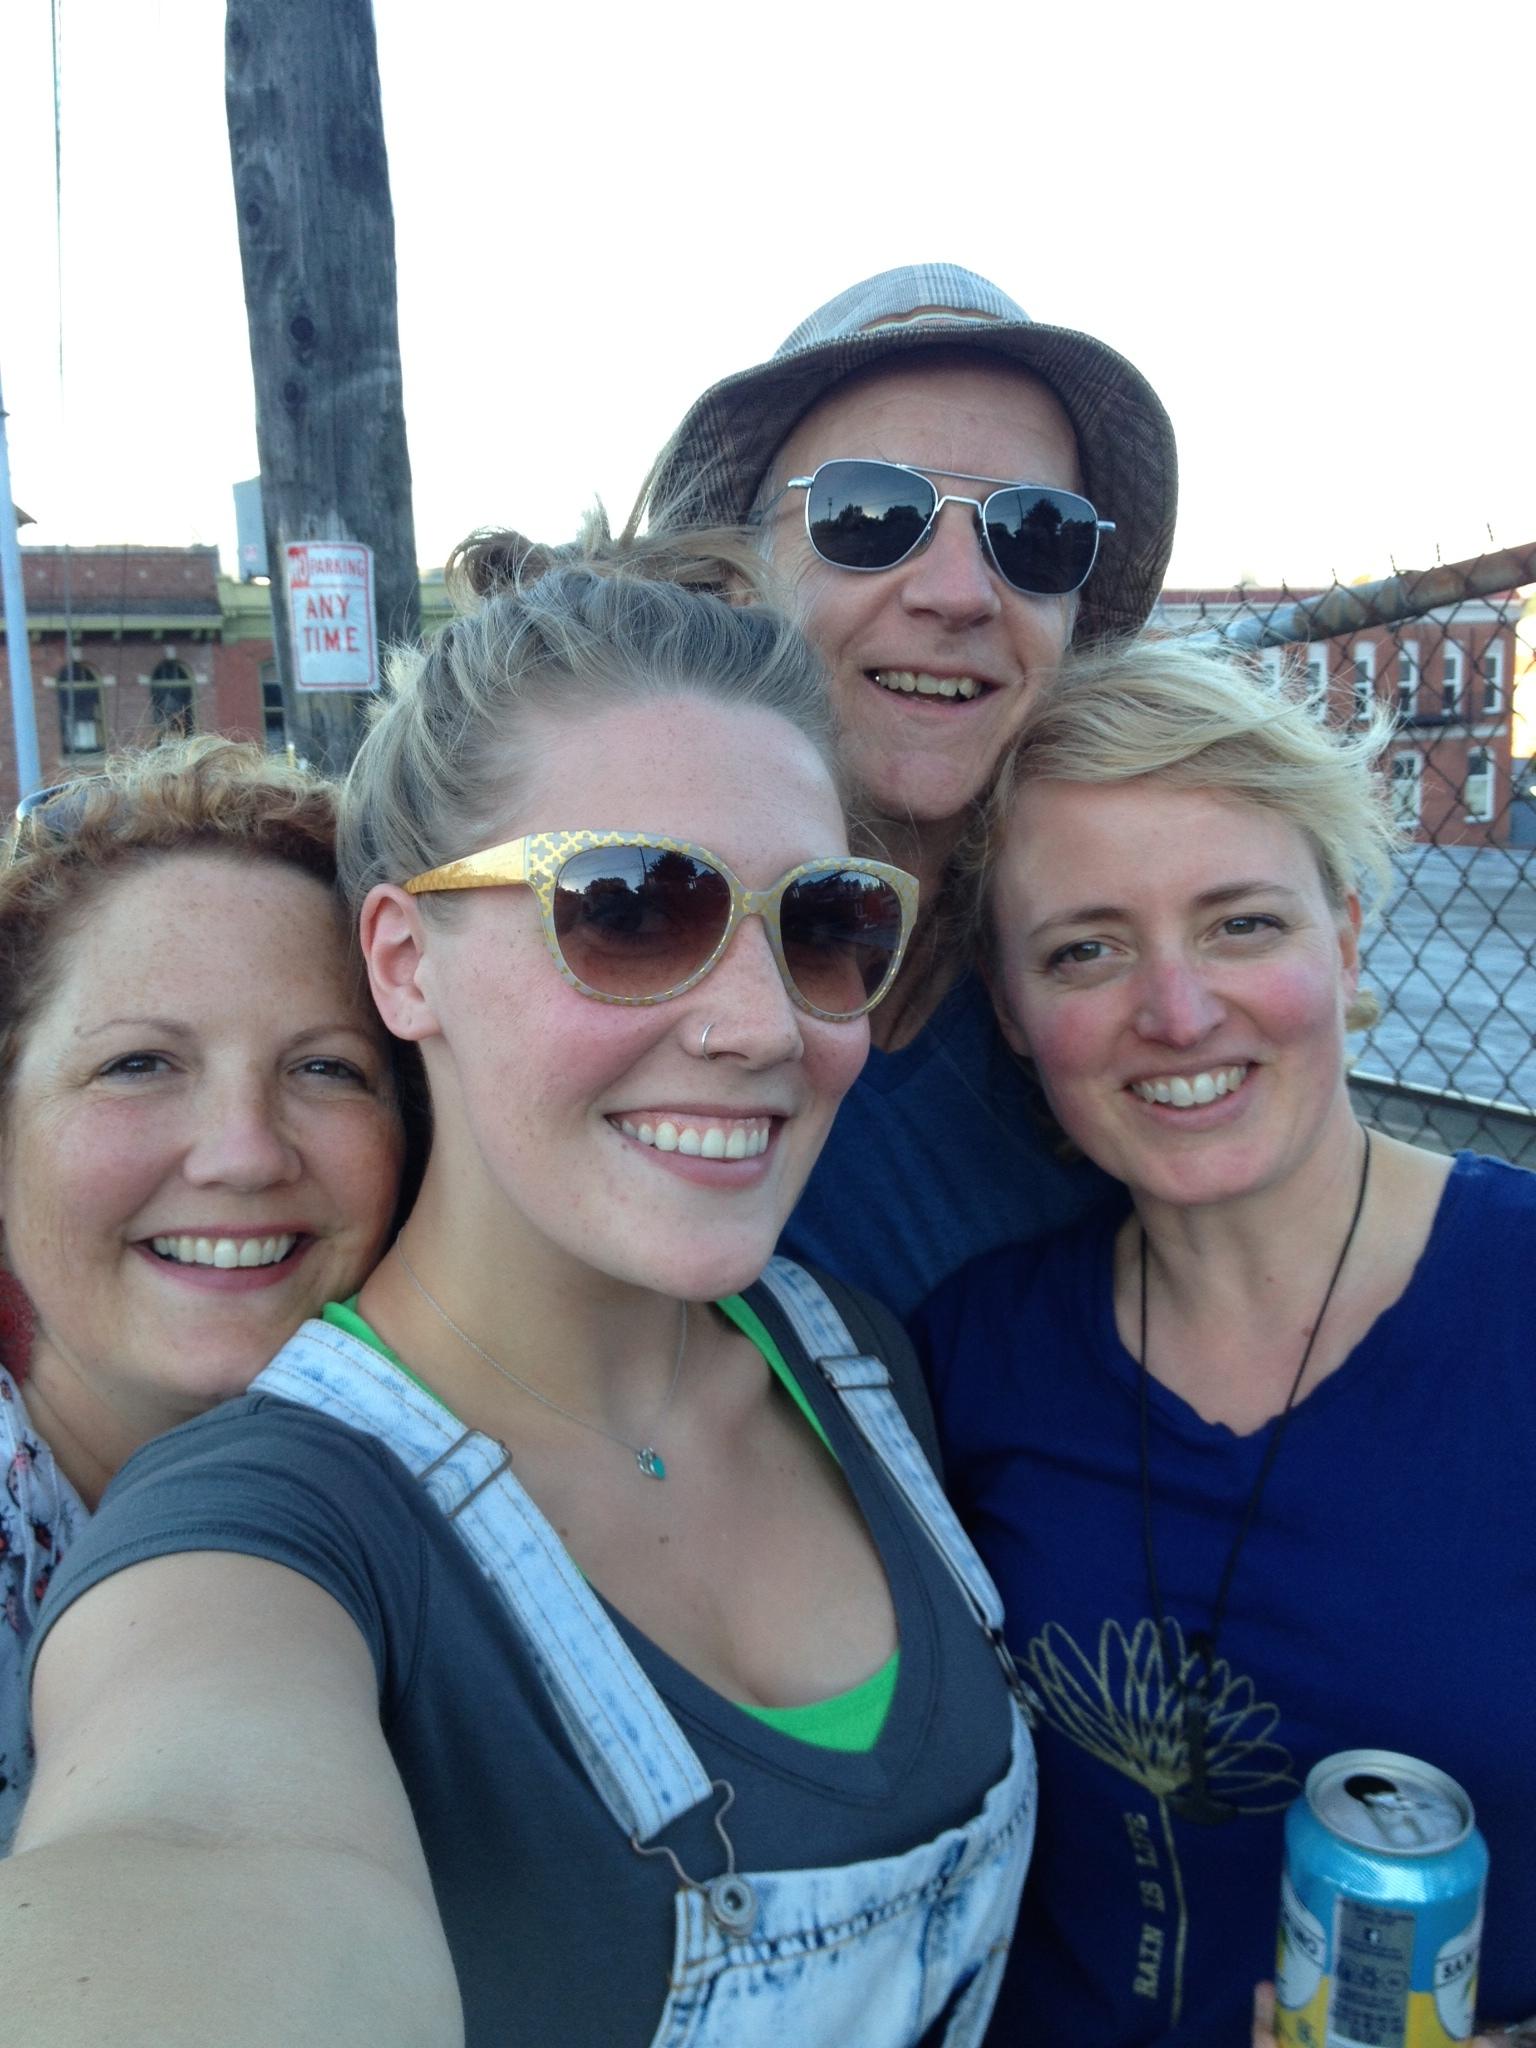 Sheila King, Ava King, Mark Bader and myself.